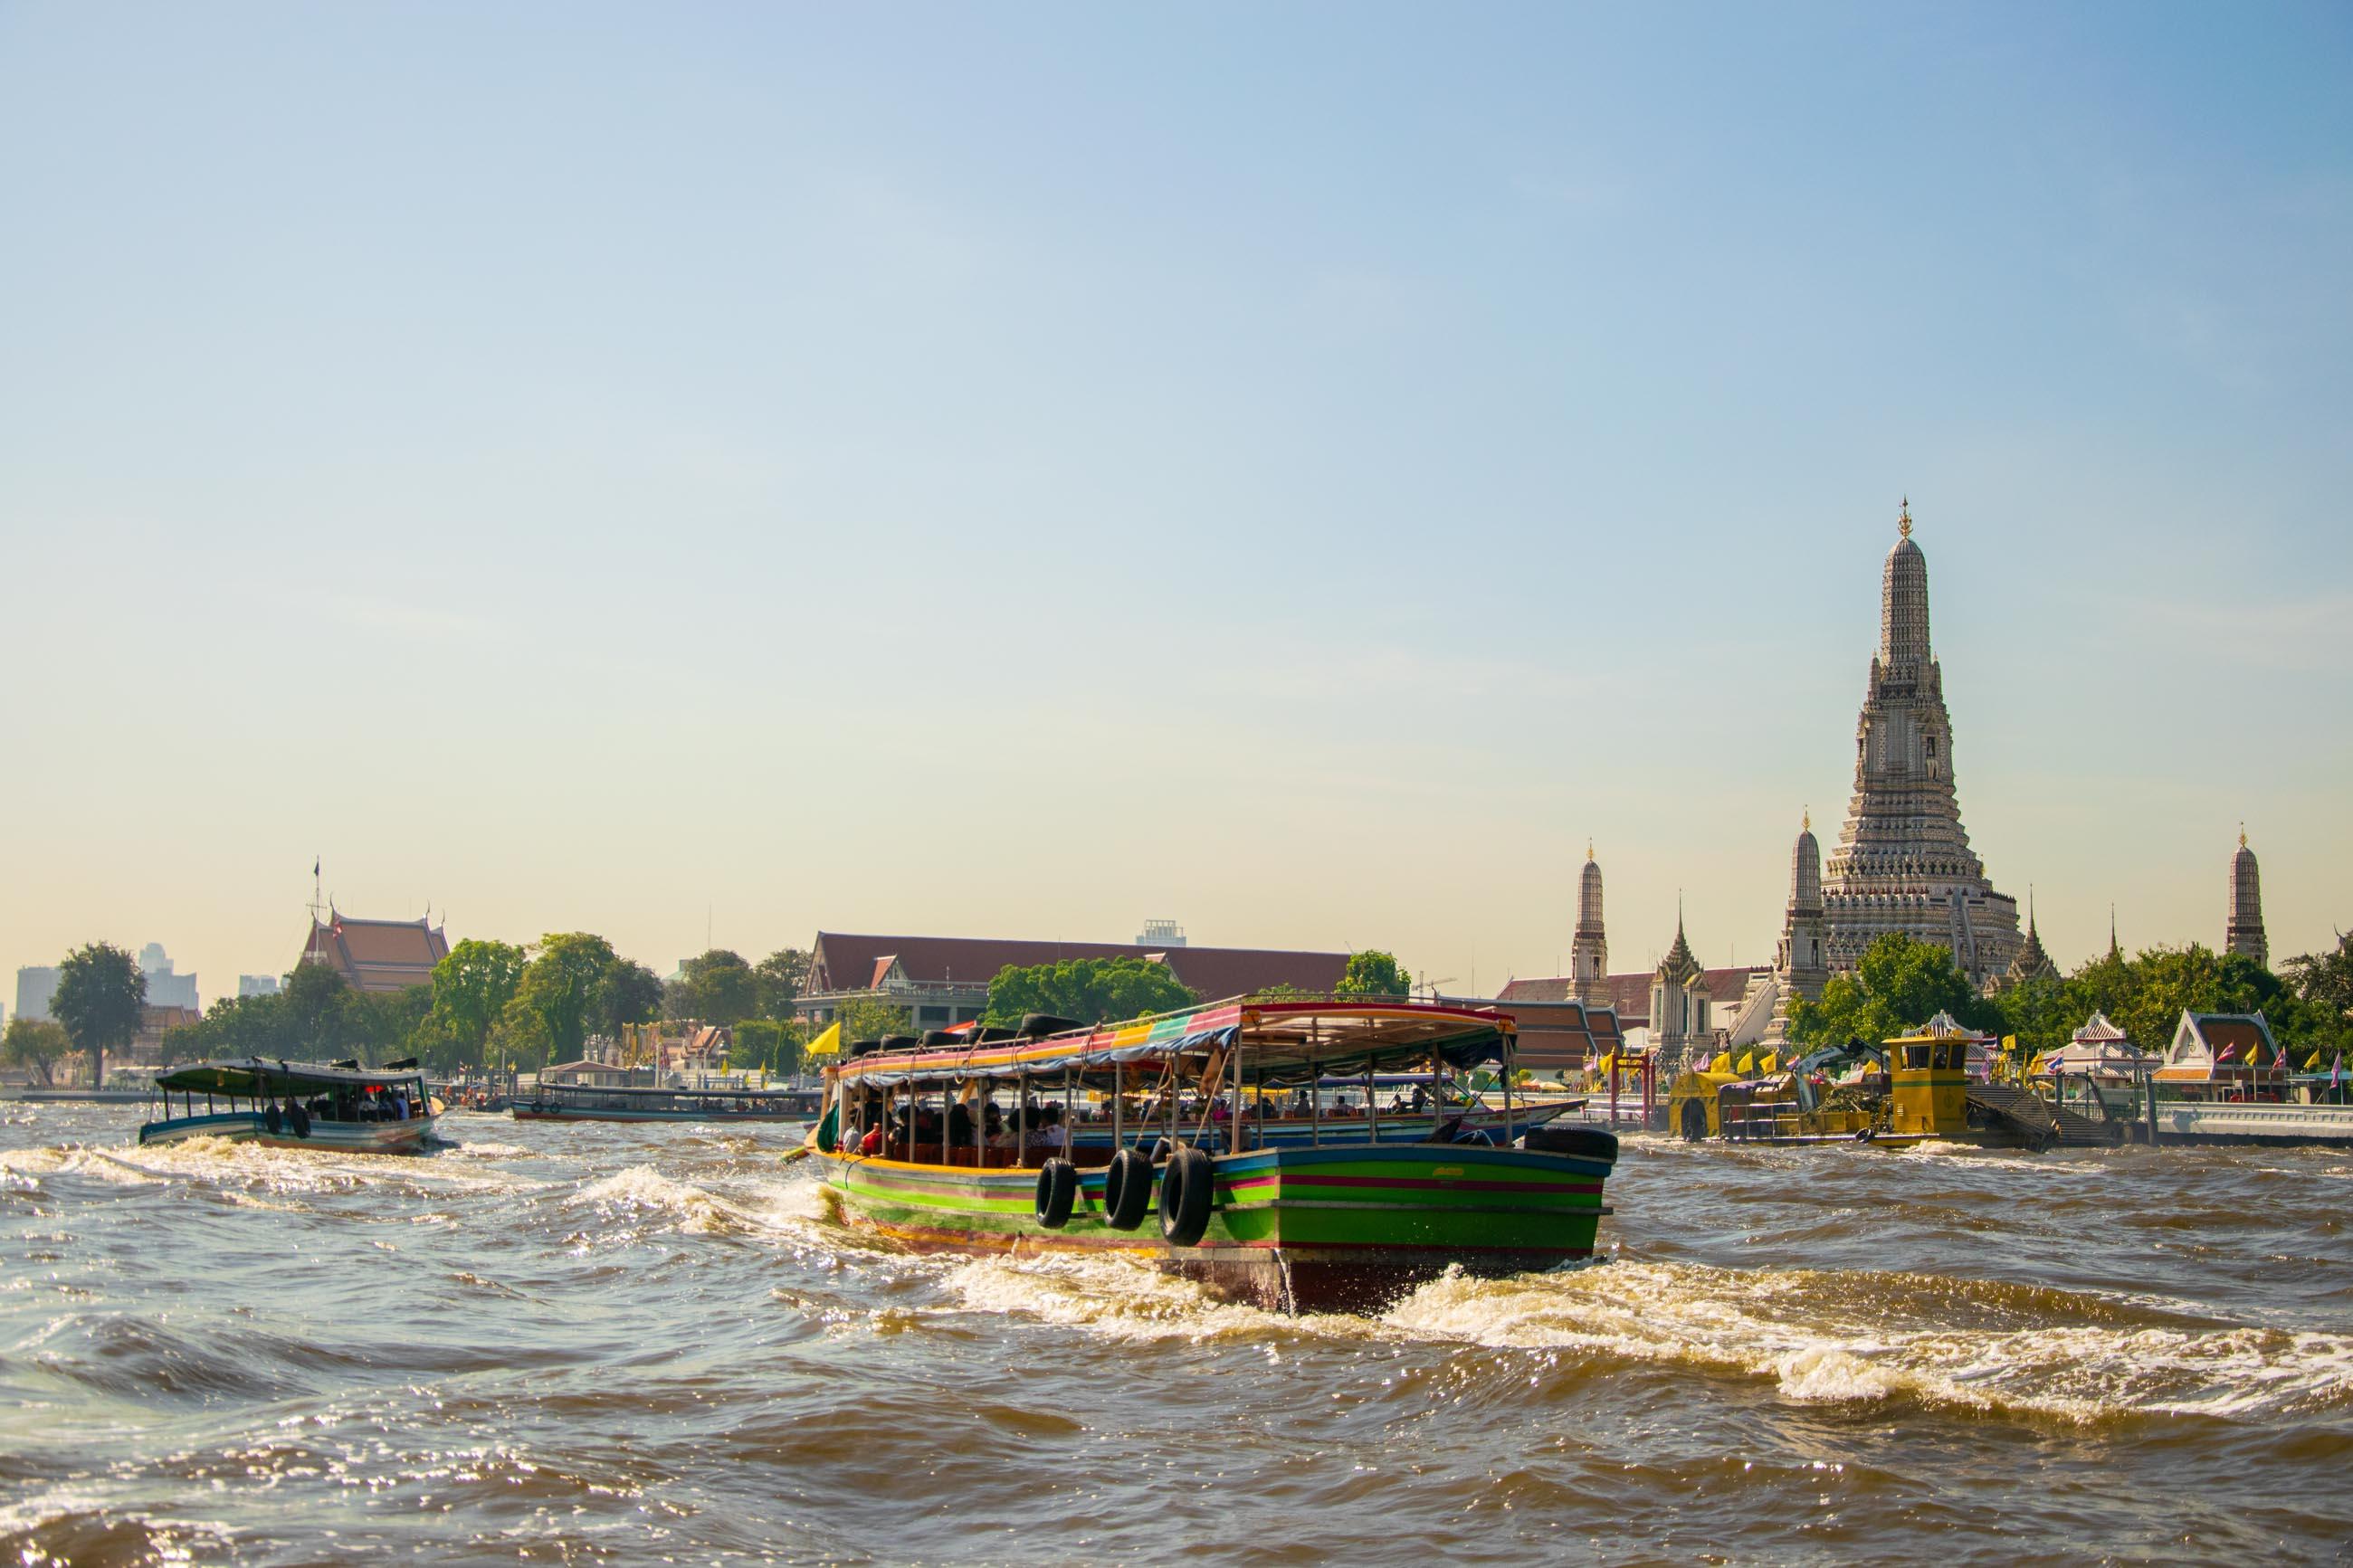 https://bubo.sk/uploads/galleries/5061/adam_zahorsky_thajsko_bangkok_dsc_0159.jpg